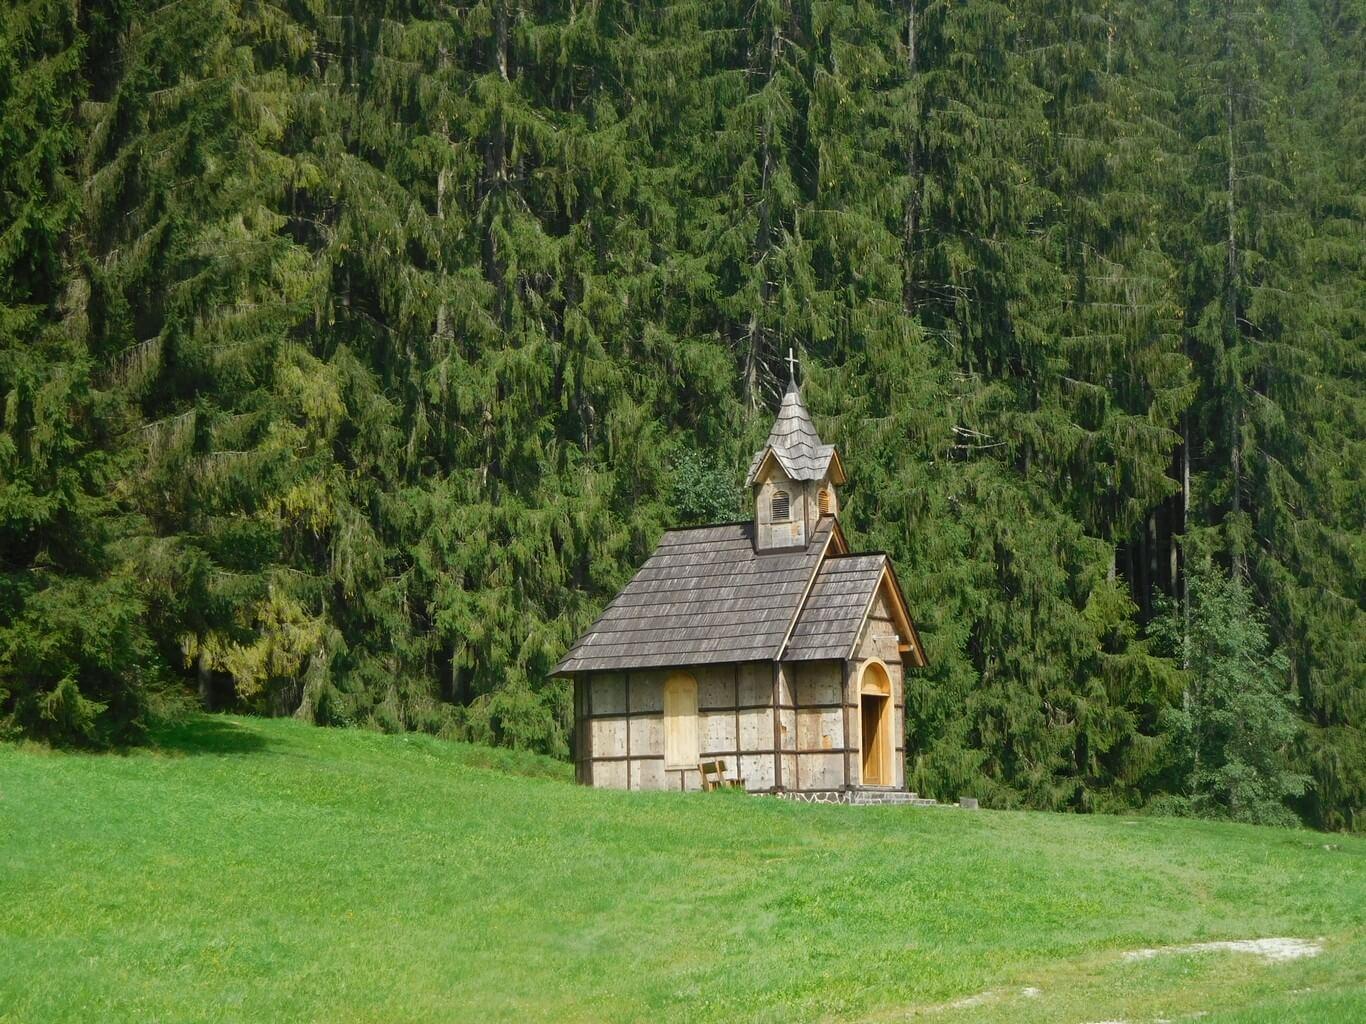 Lesnícky skanzen Vydrovo – kaplnka